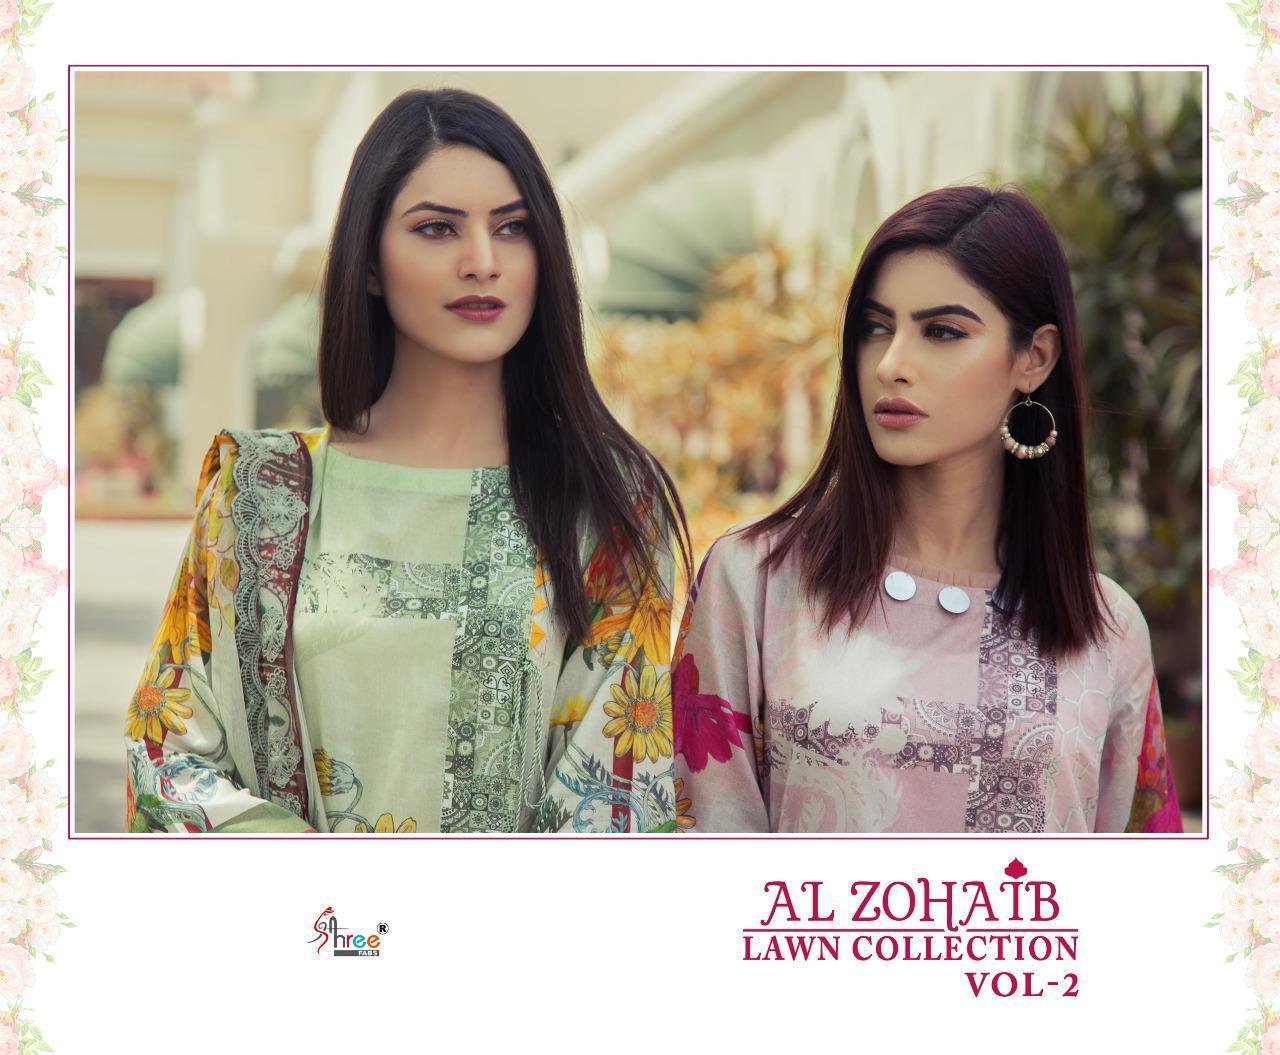 Shree Fabs Al Zohaib Lawn Collection Vol 2 Salwar Suit Wholesale Catalog 8 Pcs 10 - Shree Fabs Al Zohaib Lawn Collection Vol 2 Salwar Suit Wholesale Catalog 8 Pcs